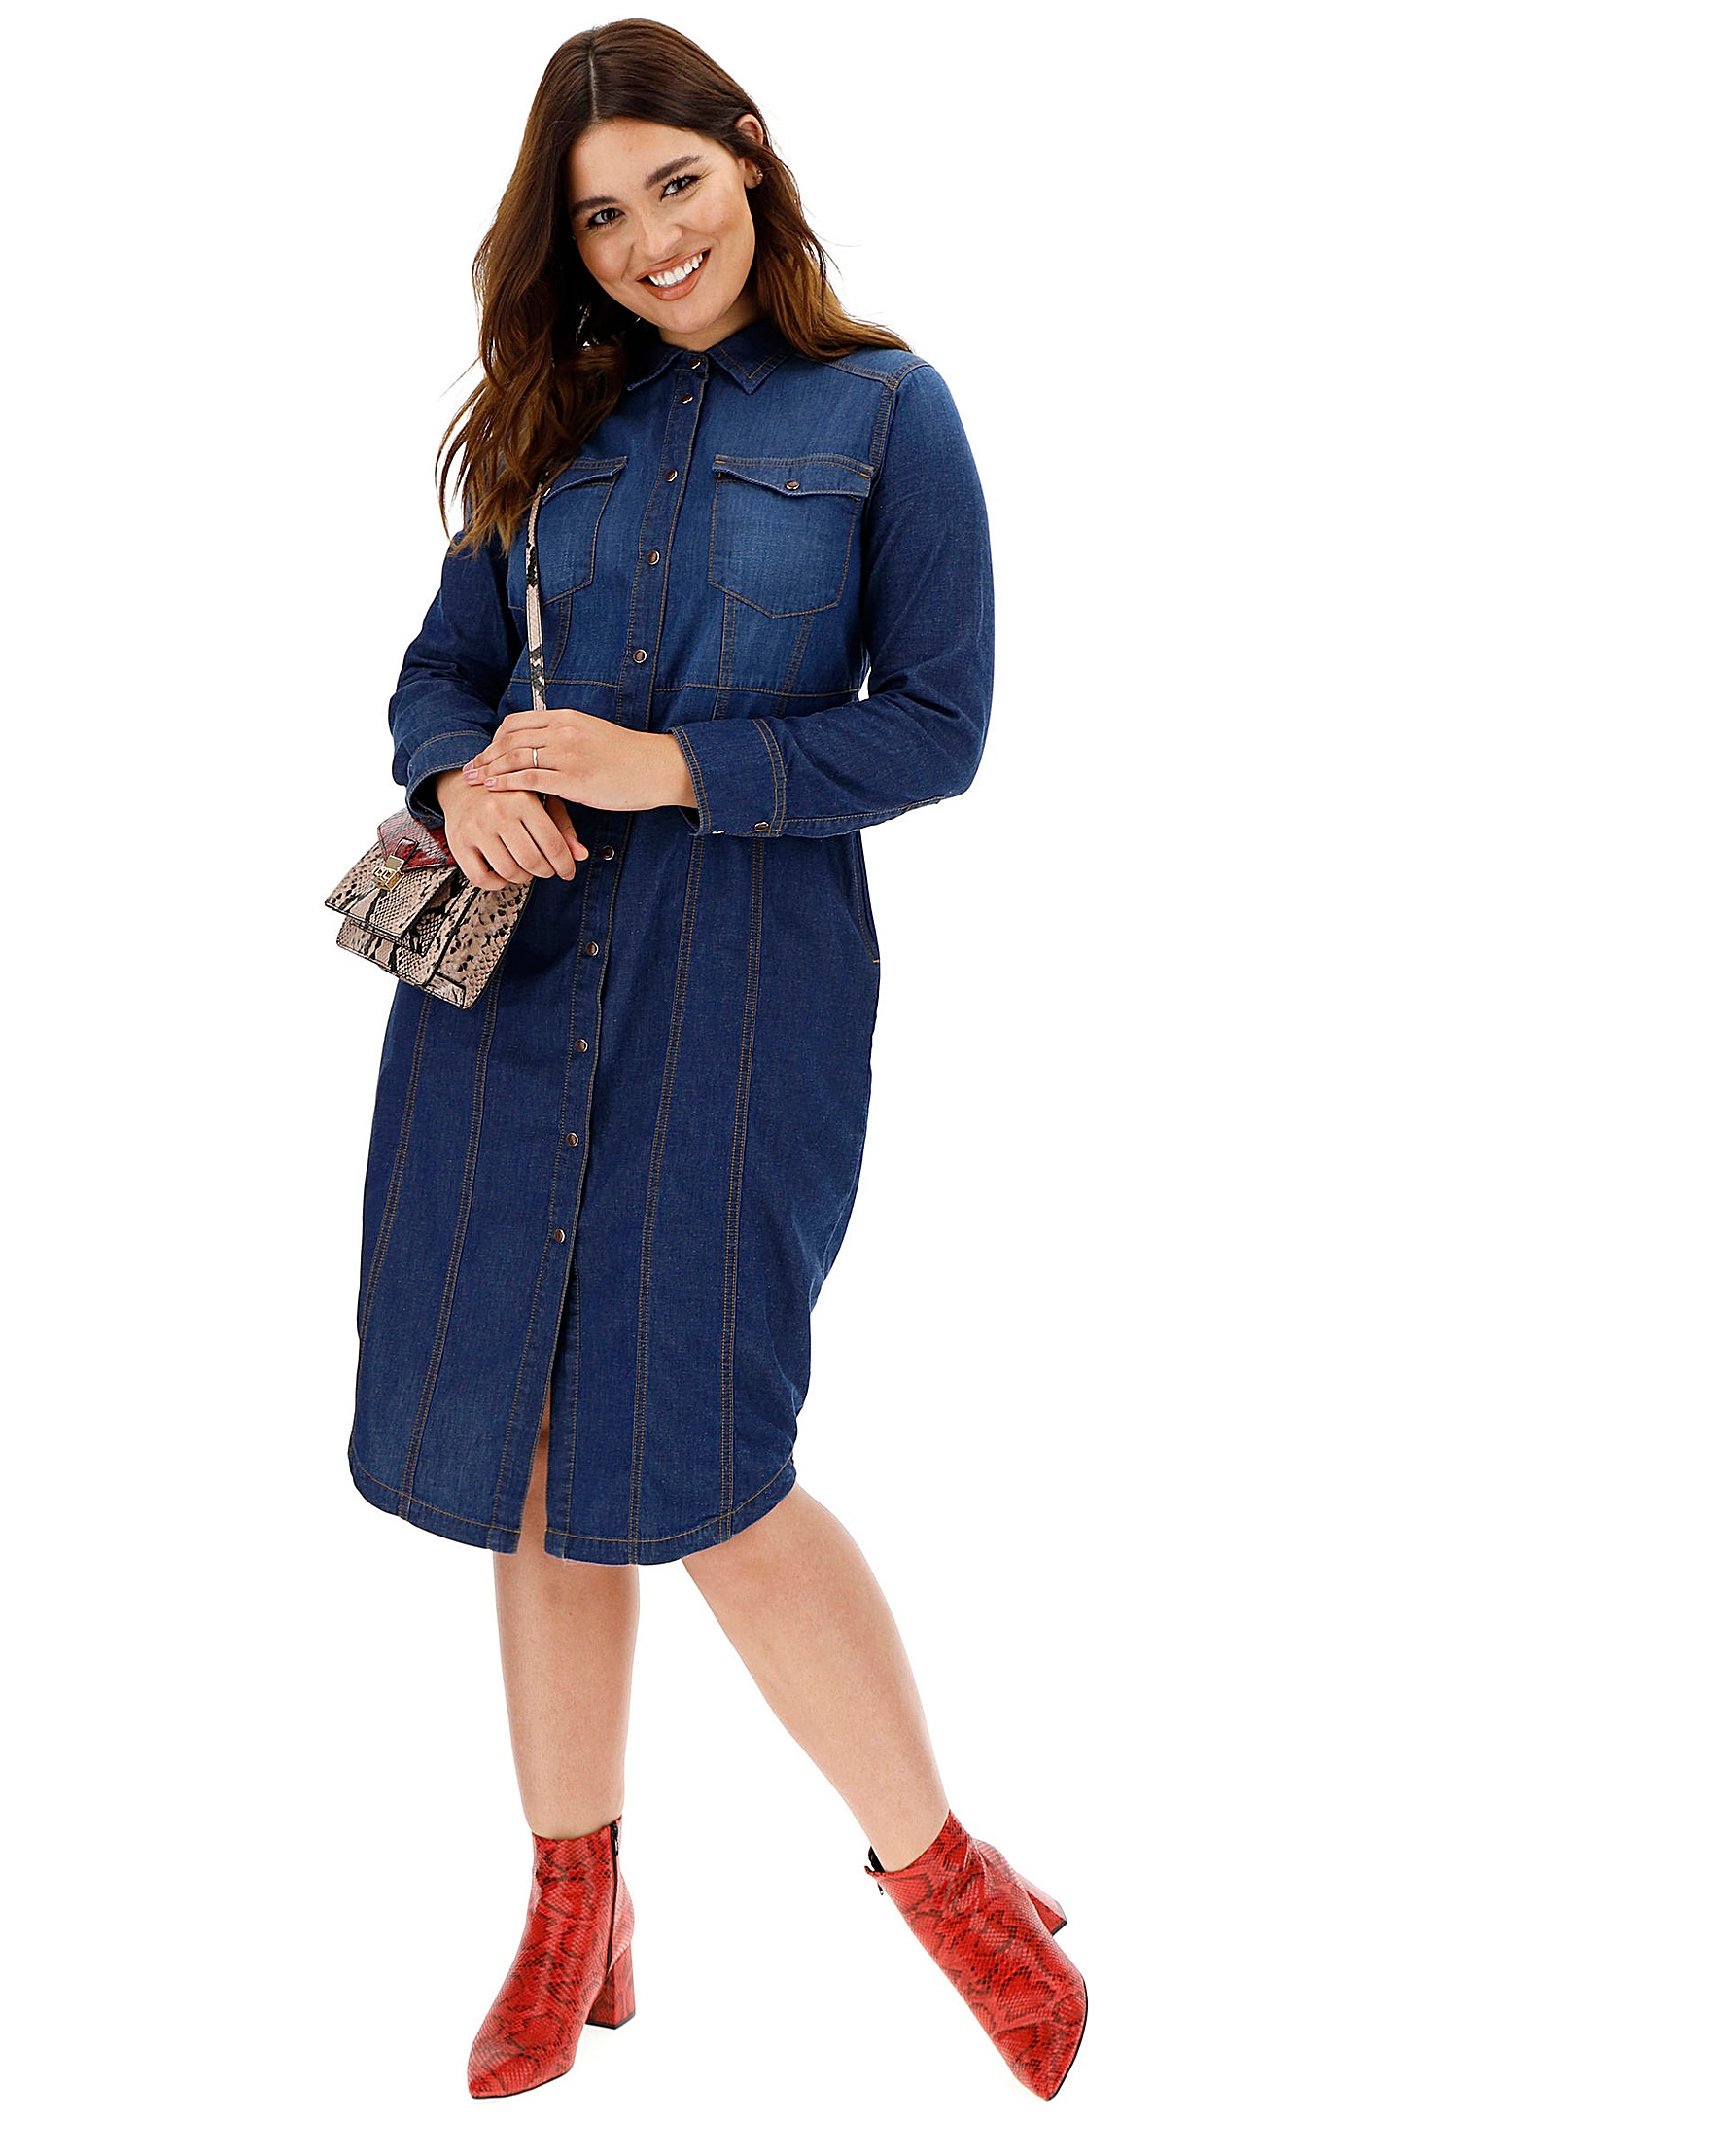 81e2b0f0ad05 Western Style Denim Shirt Dress   Simply Be